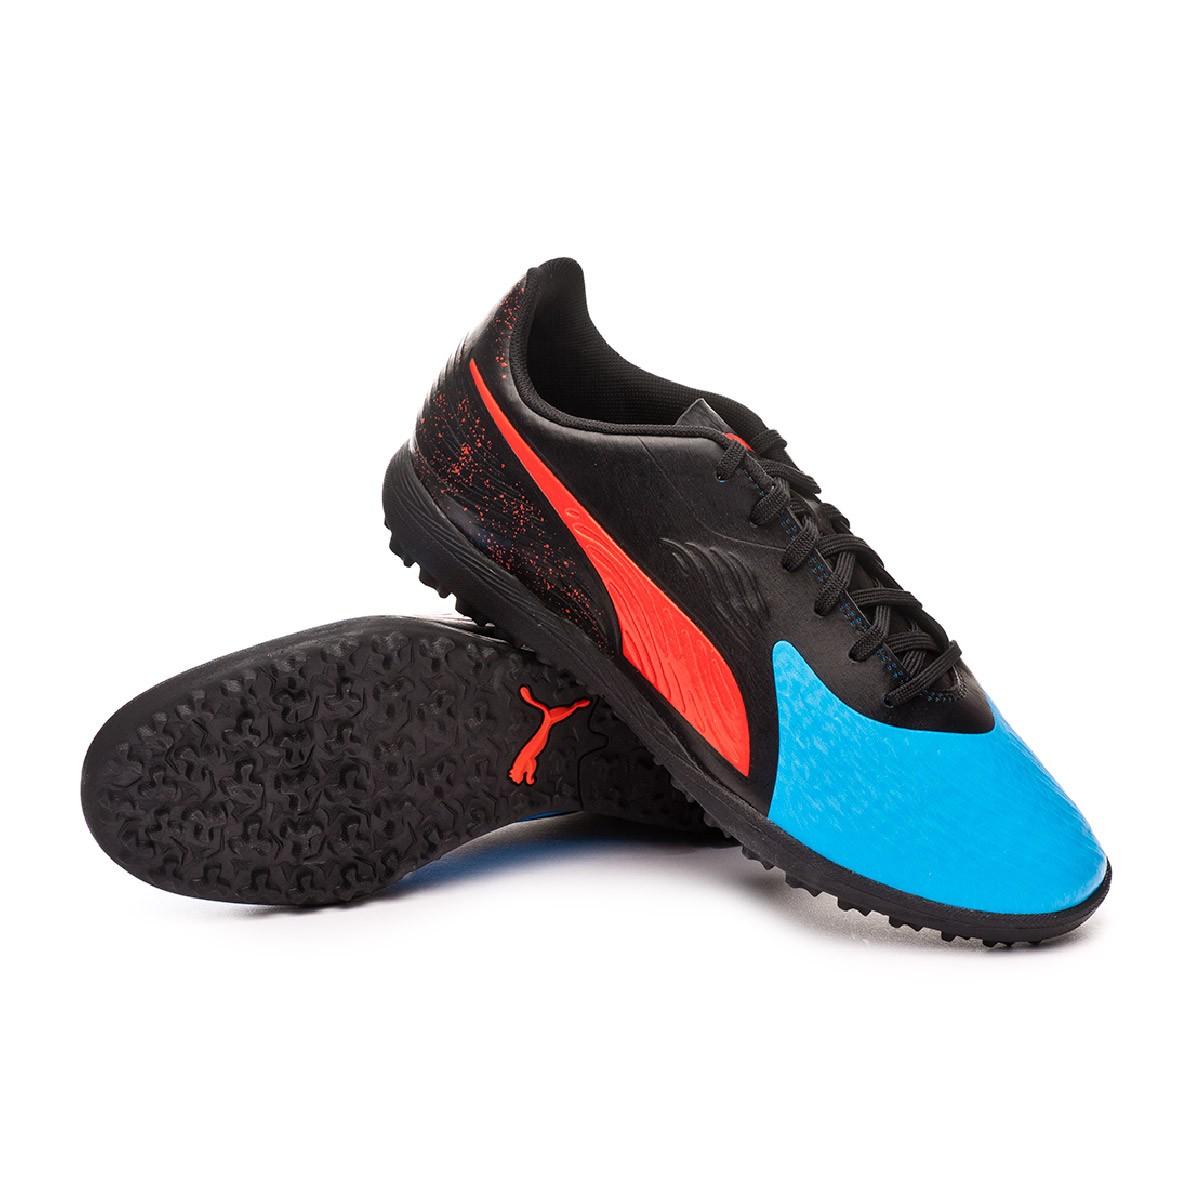 e7bbd2293a5e Football Boot Puma One 19.4 Turf Bleu azur-Red blast-Black - Football store  Fútbol Emotion